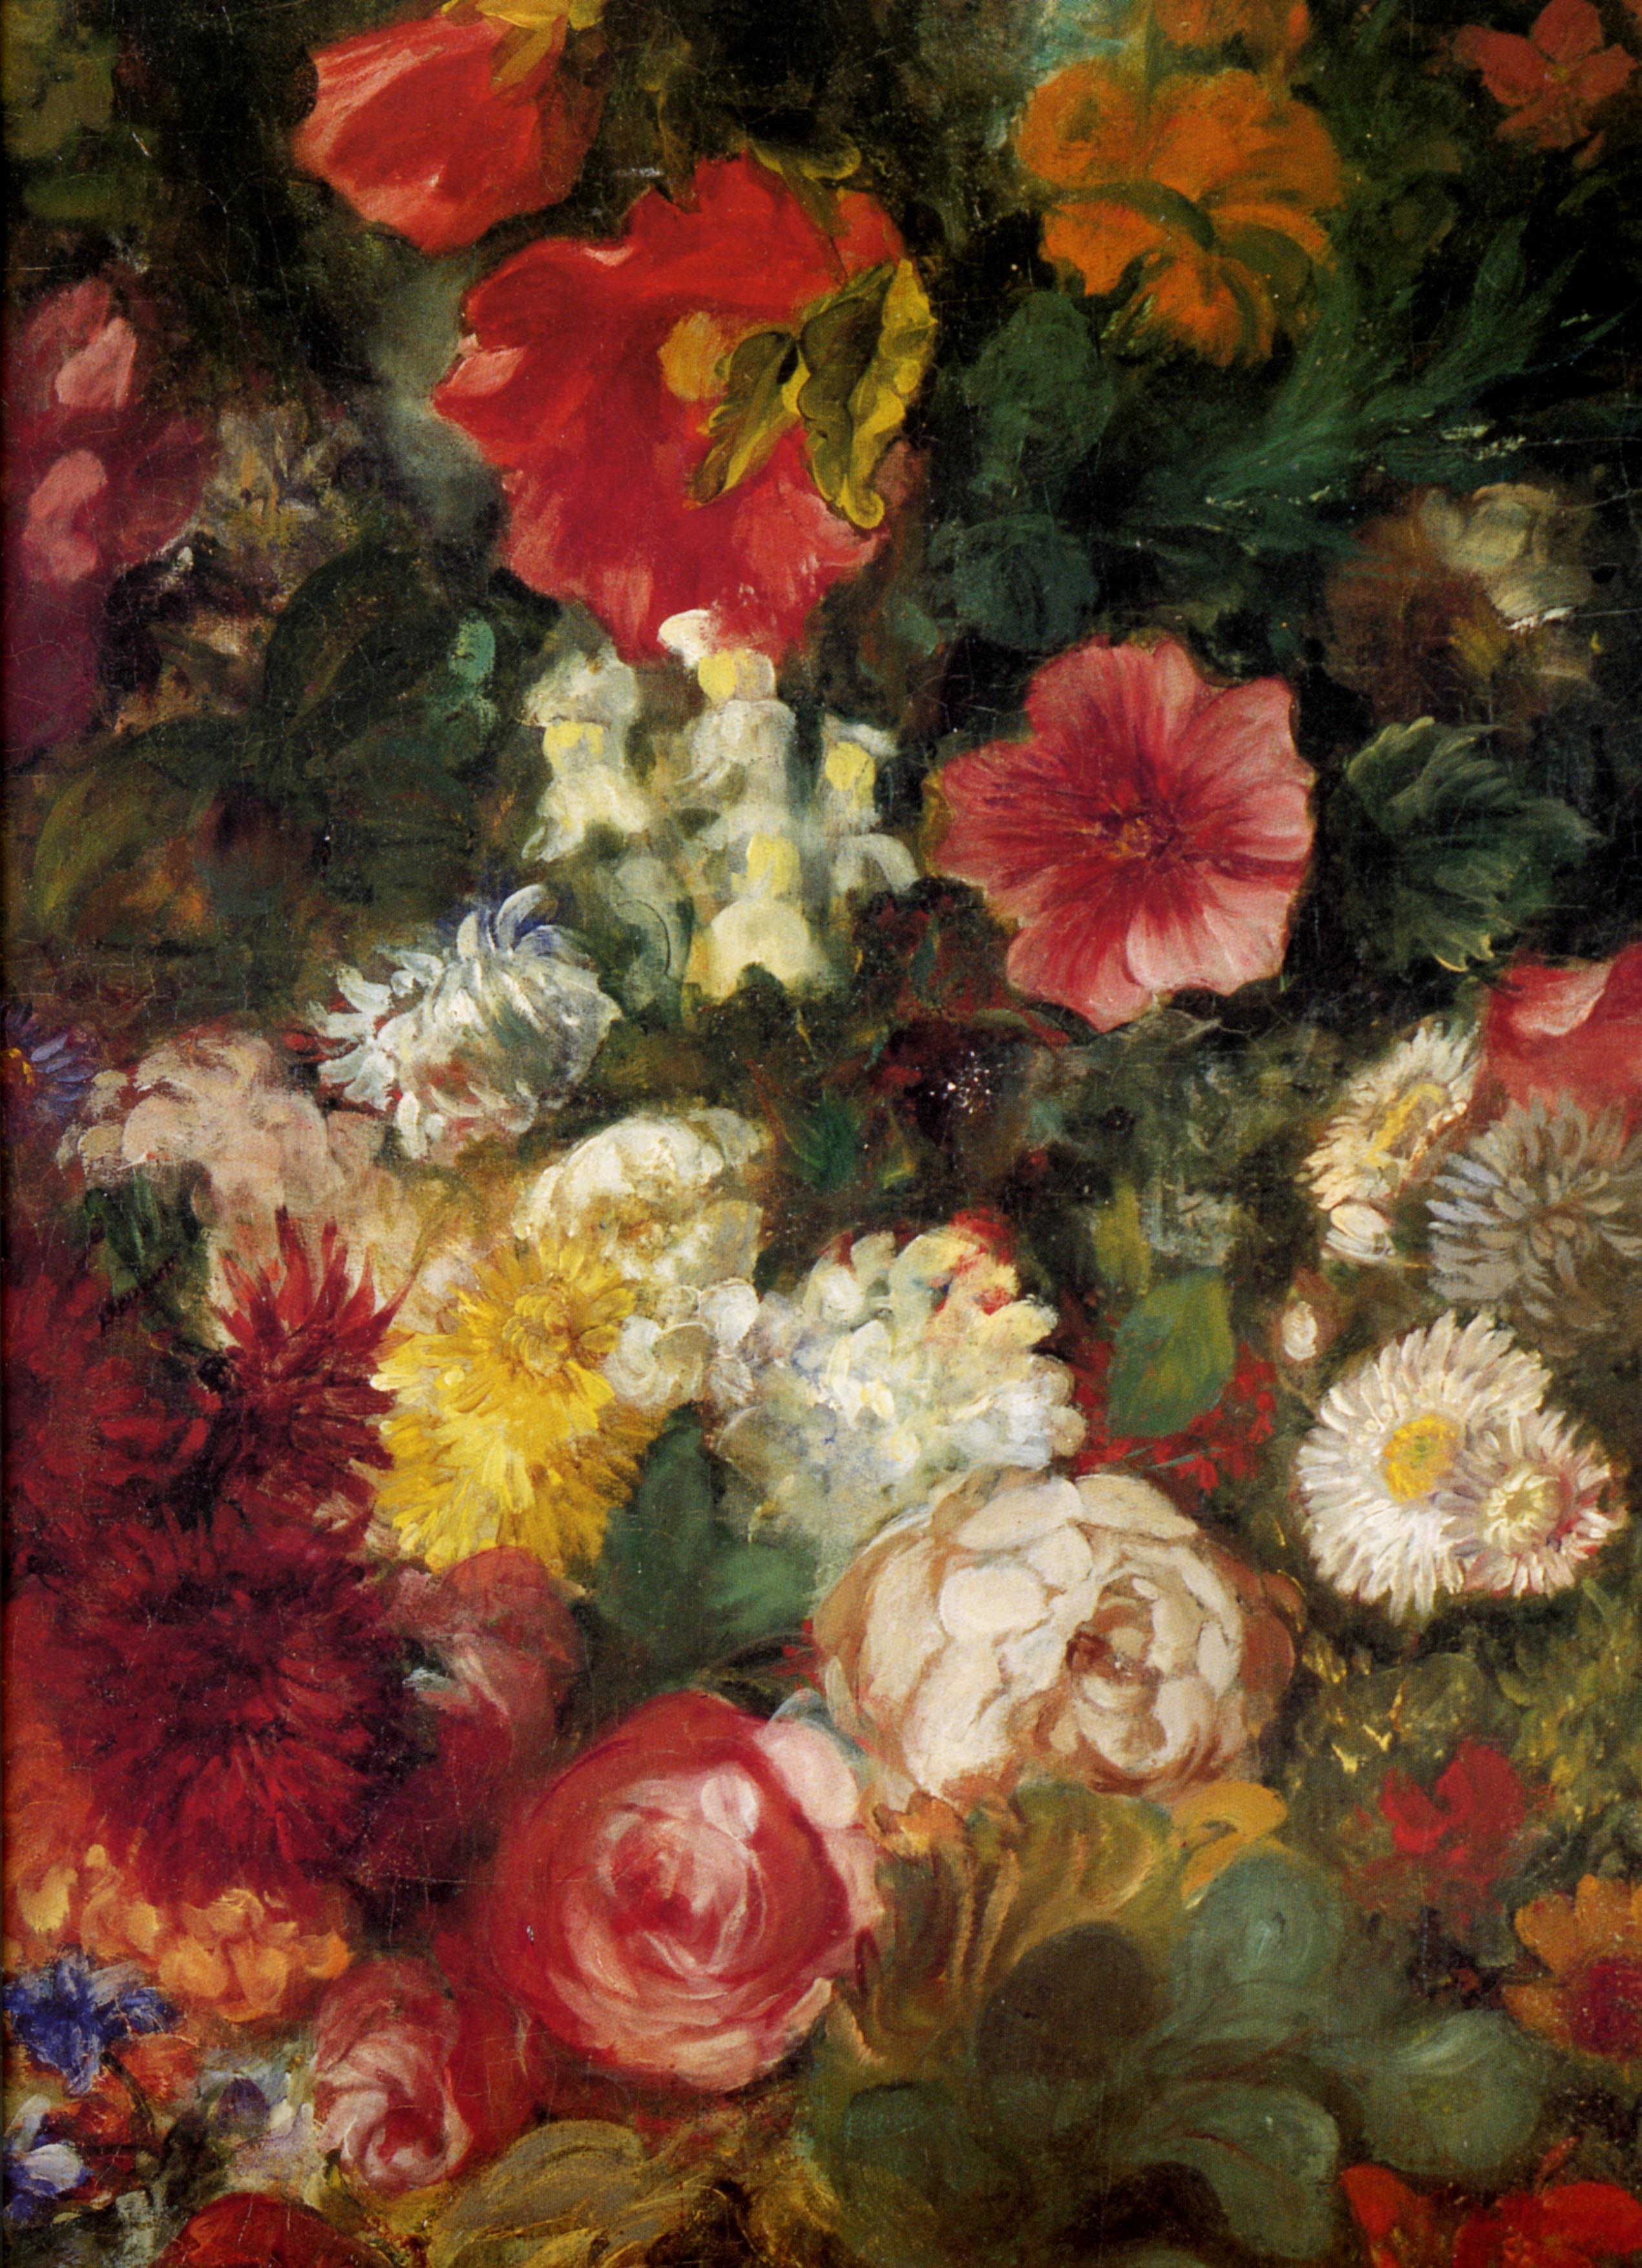 Эжен Делакруа | XIXe | Eugene Delacroix (190 работ): nevsepic.com.ua/art-i-risovanaya-grafika/page,1,10118-ezhen...